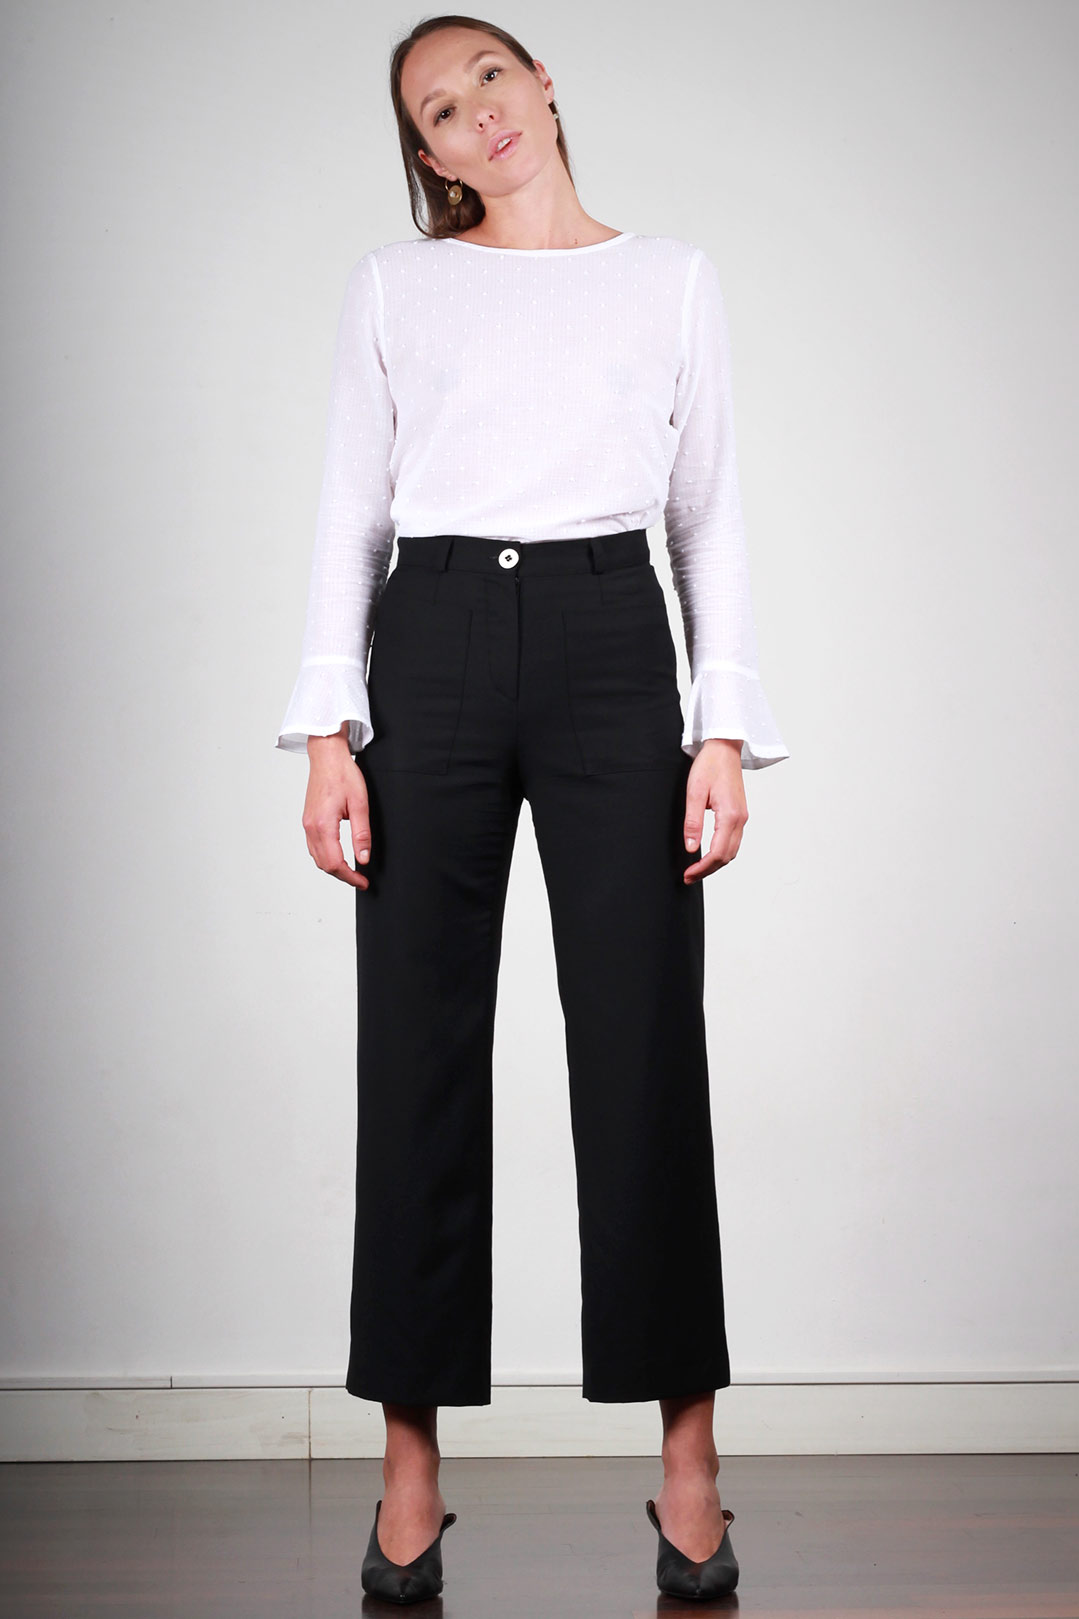 pantalon large femme taille haute en laine noire made in france atode. Black Bedroom Furniture Sets. Home Design Ideas